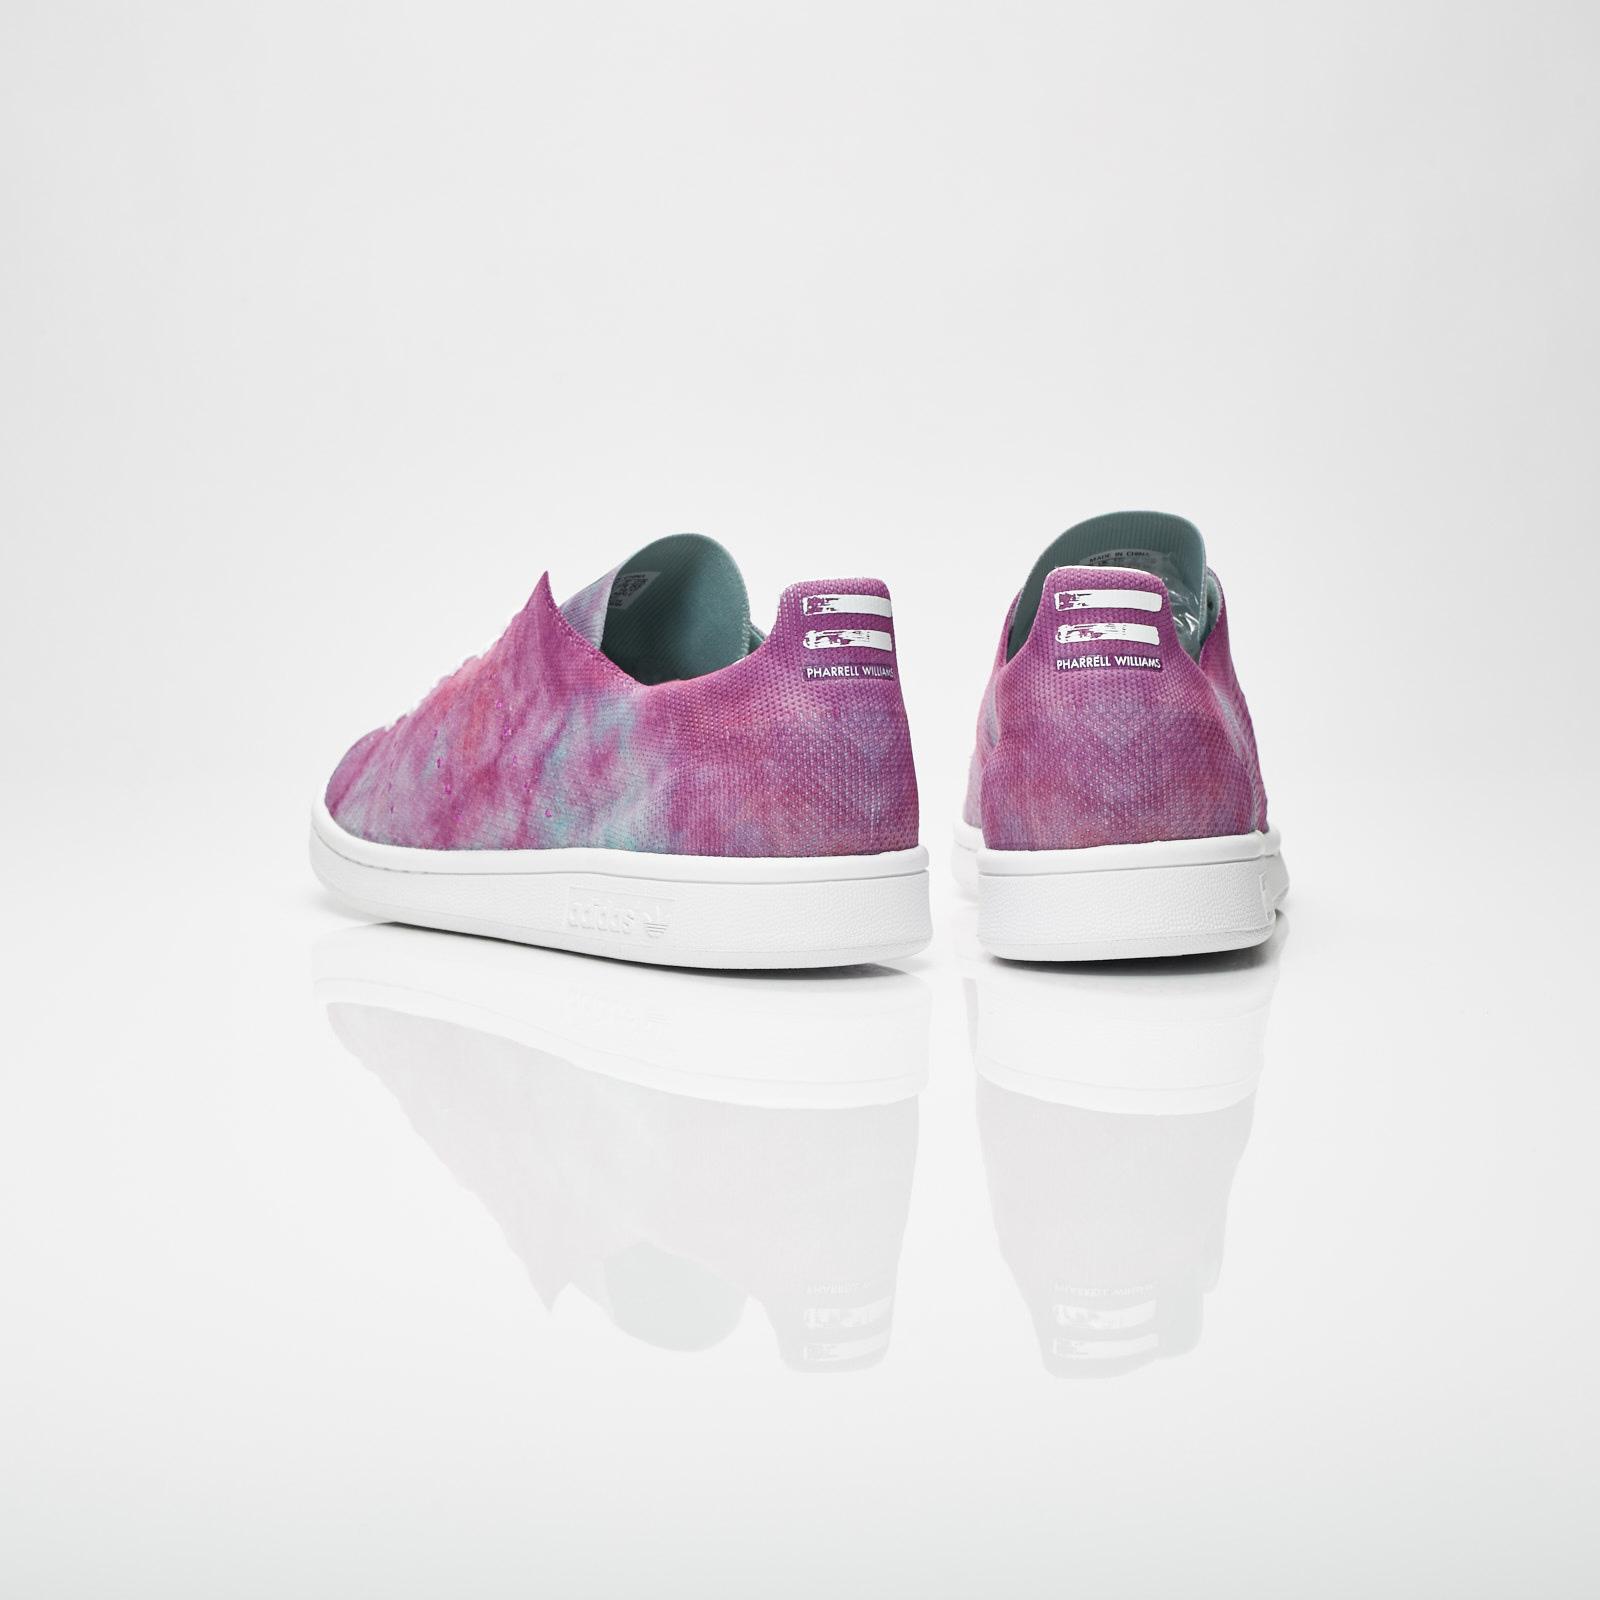 dfe00cb955031 adidas Pharrell Williams HU Holi Stan Smith MC - Da9612 - Sneakersnstuff